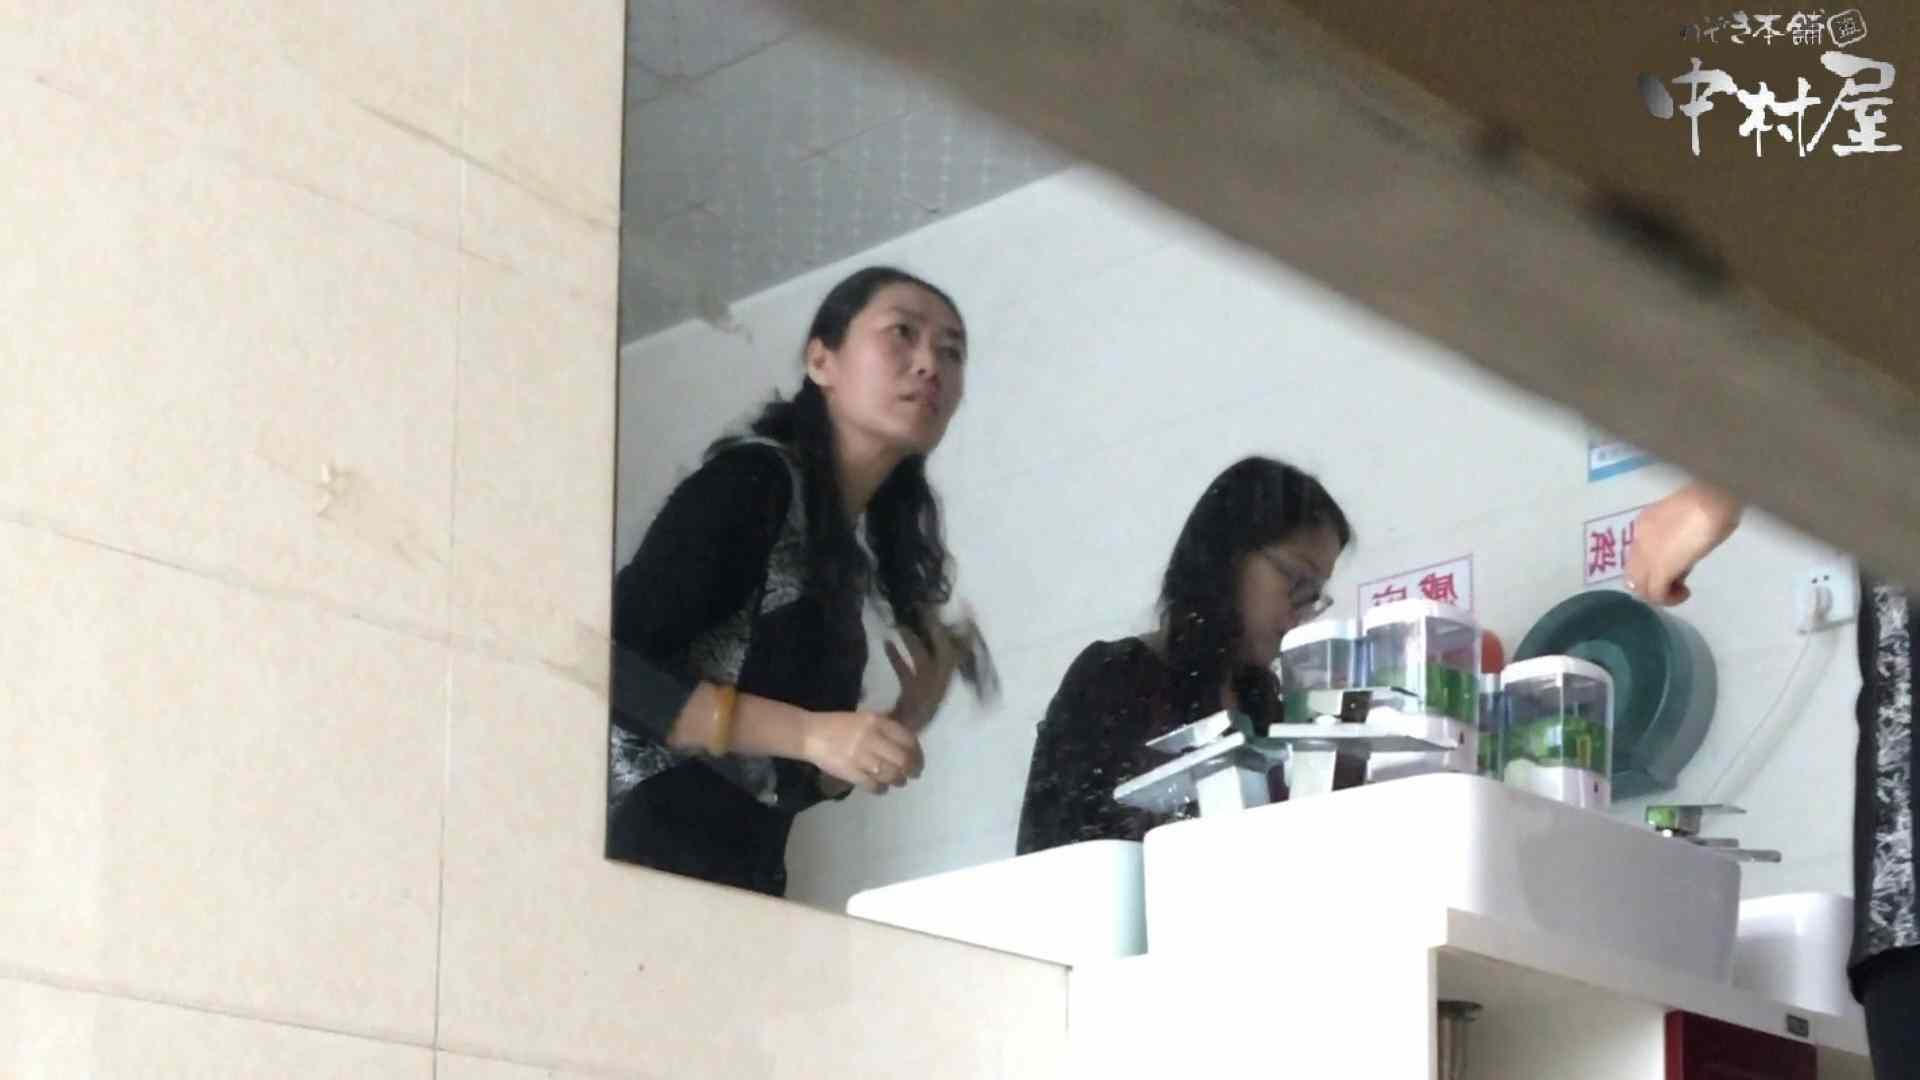 GOD HAND 芸術大学盗撮‼vol.112 盗撮 ワレメ無修正動画無料 106画像 51